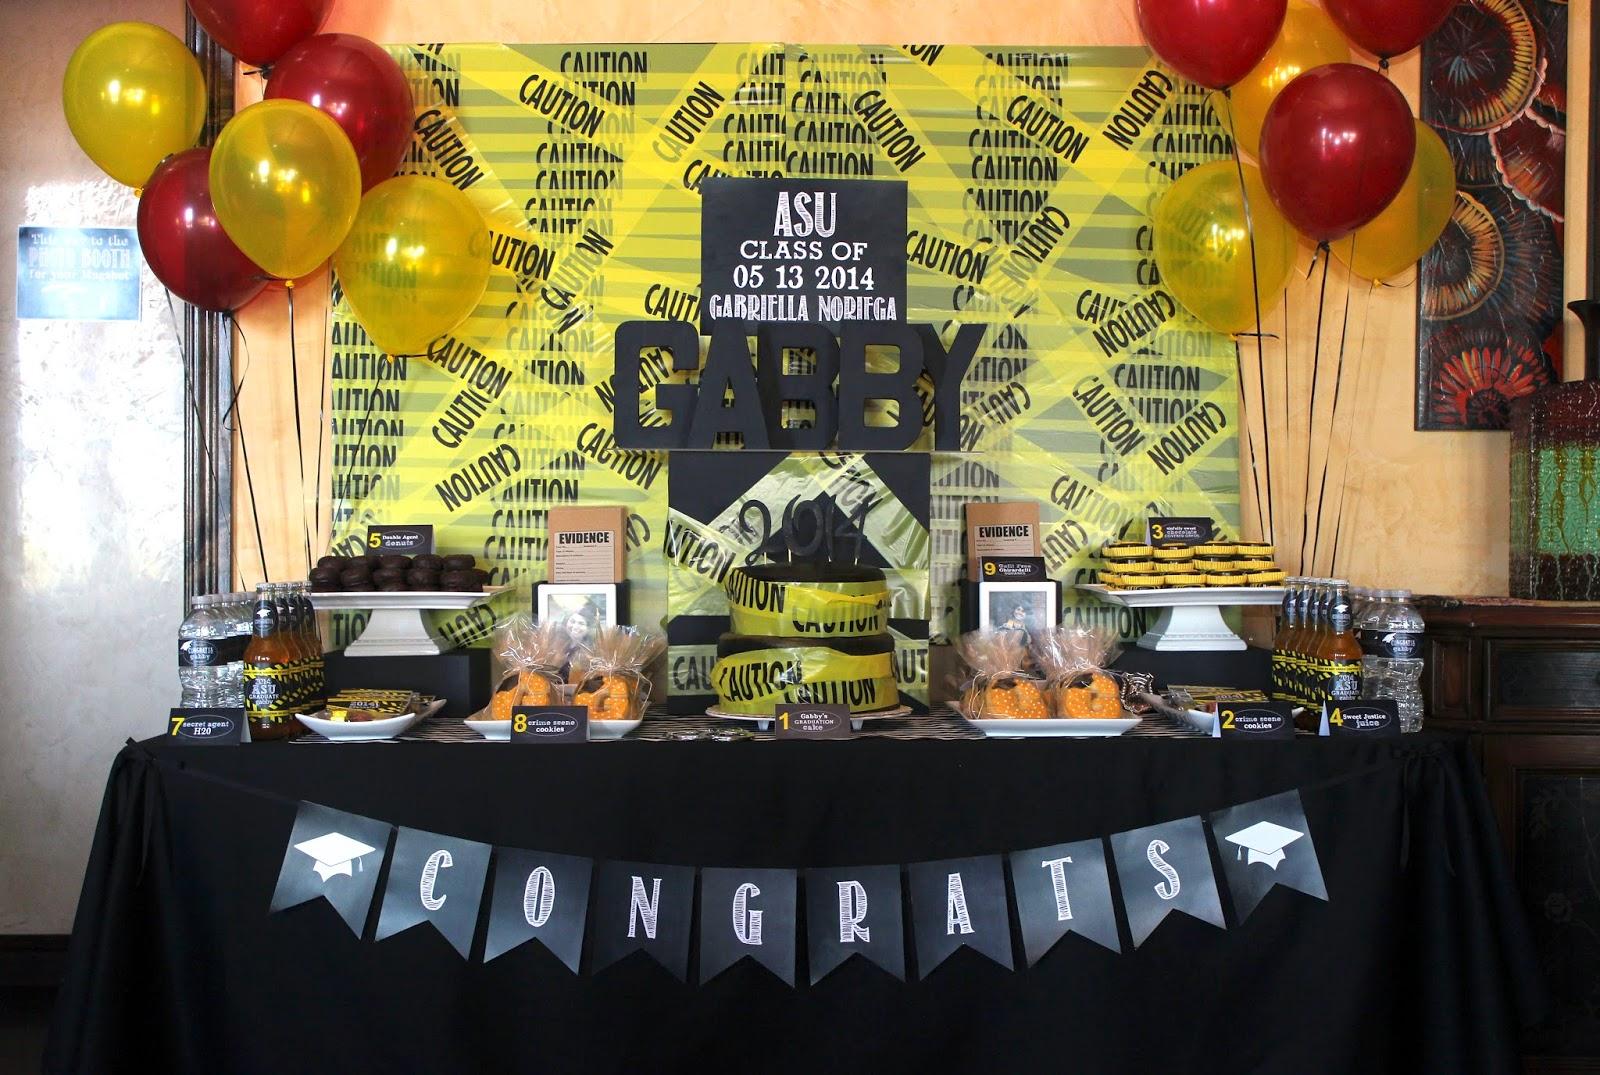 2014 graduation decorations -  Party Bee Gabby S Criminology Graduation Party